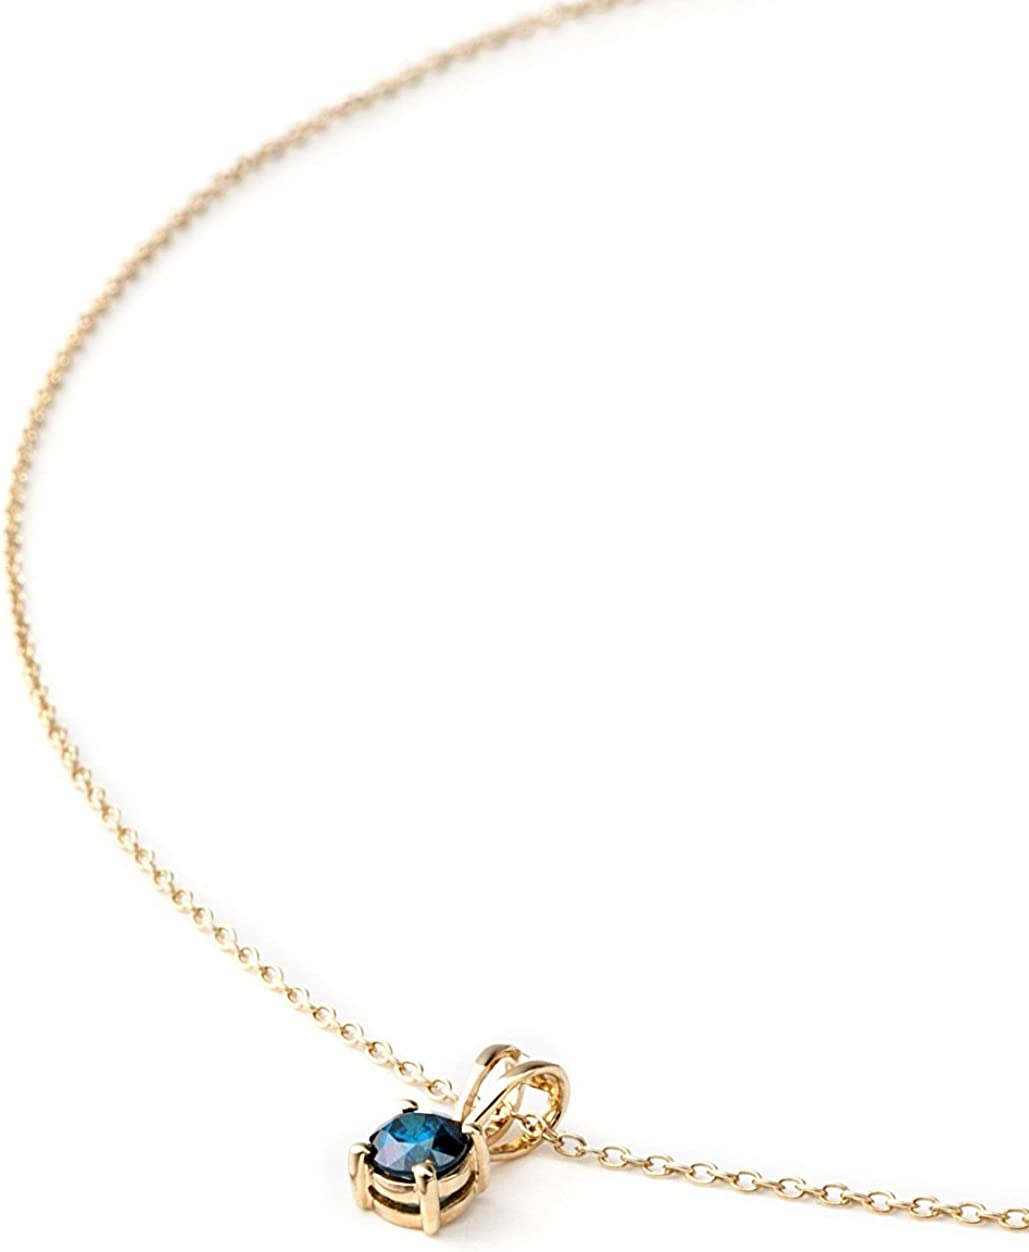 Silverstone ancé–Joyería Femenina Collar–925plata, rodio–verdadera piedras preciosas a elegir